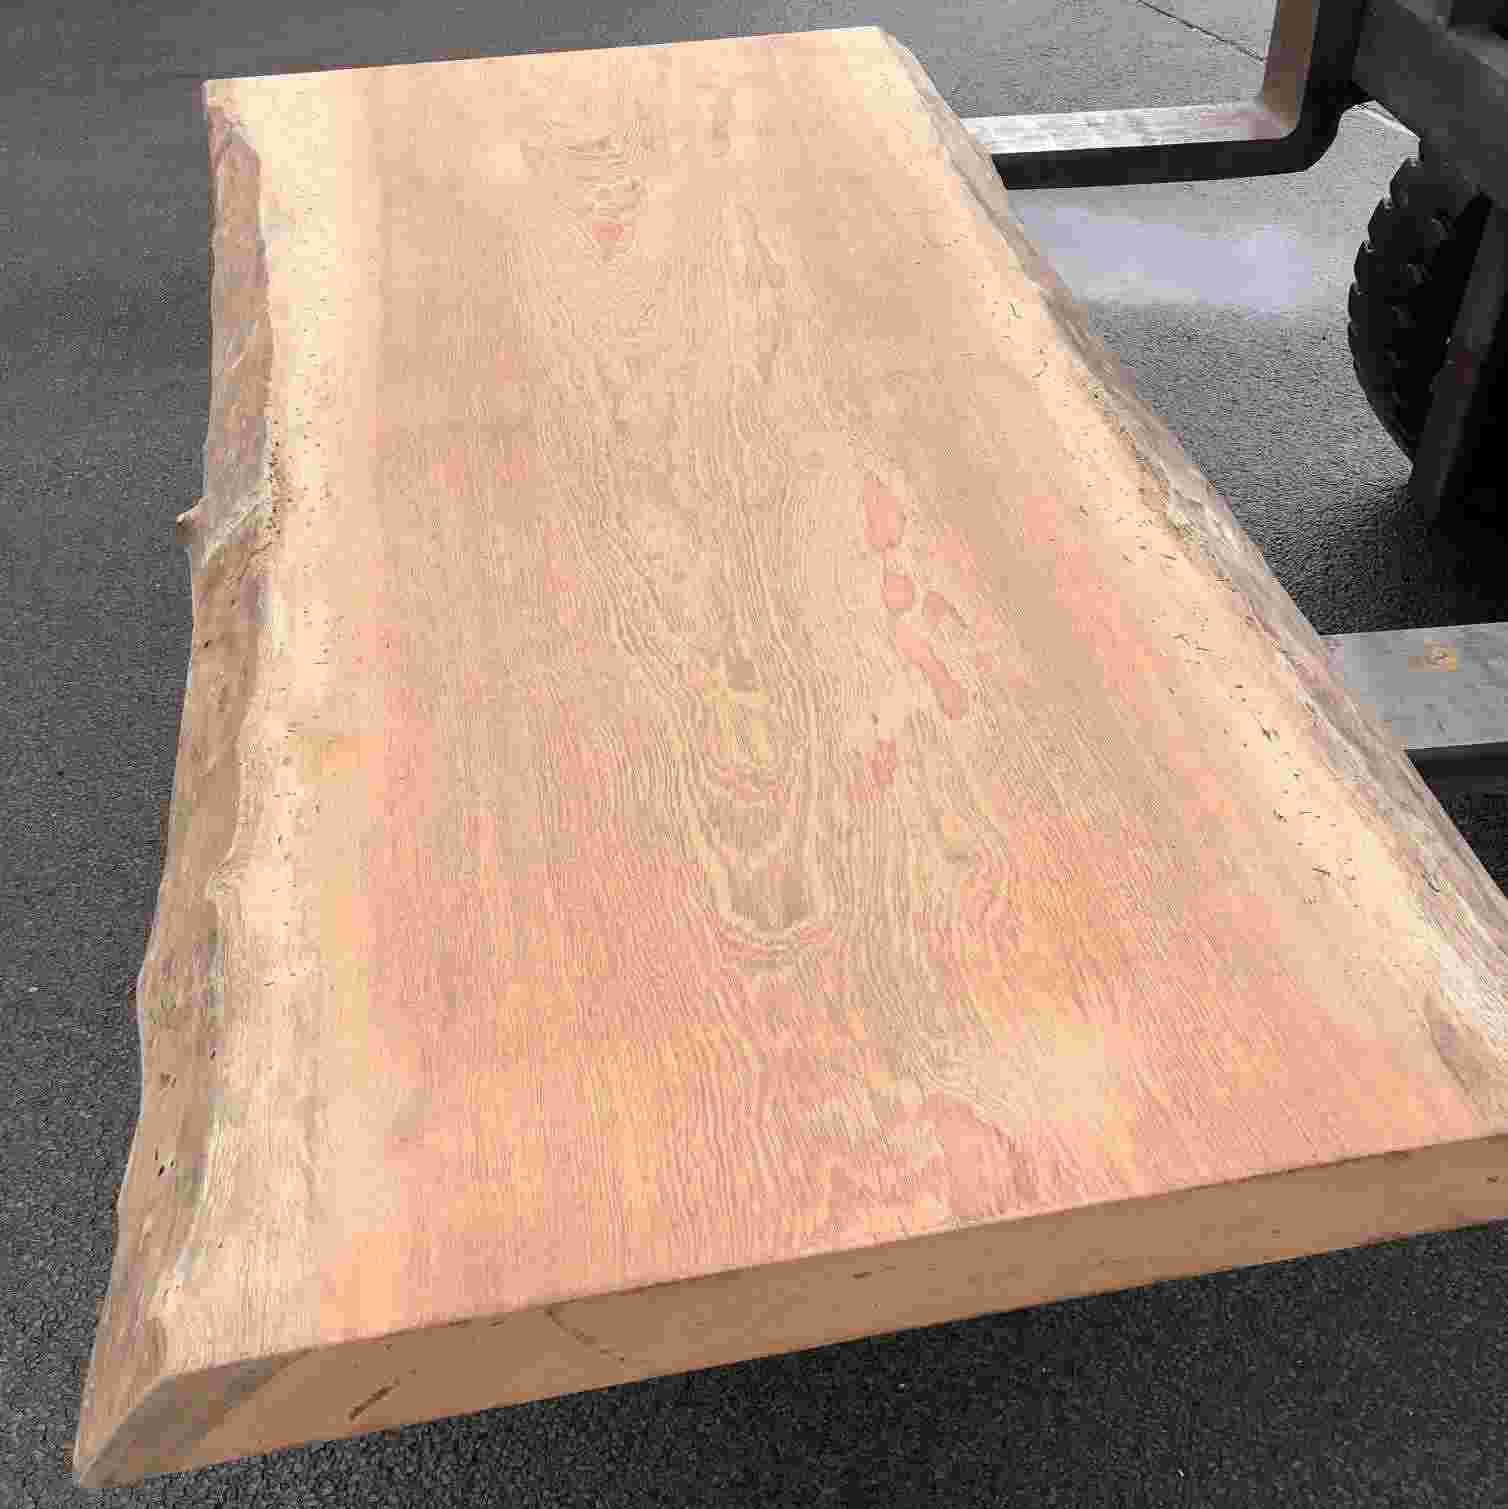 boomstamblad hoofdfoto 2